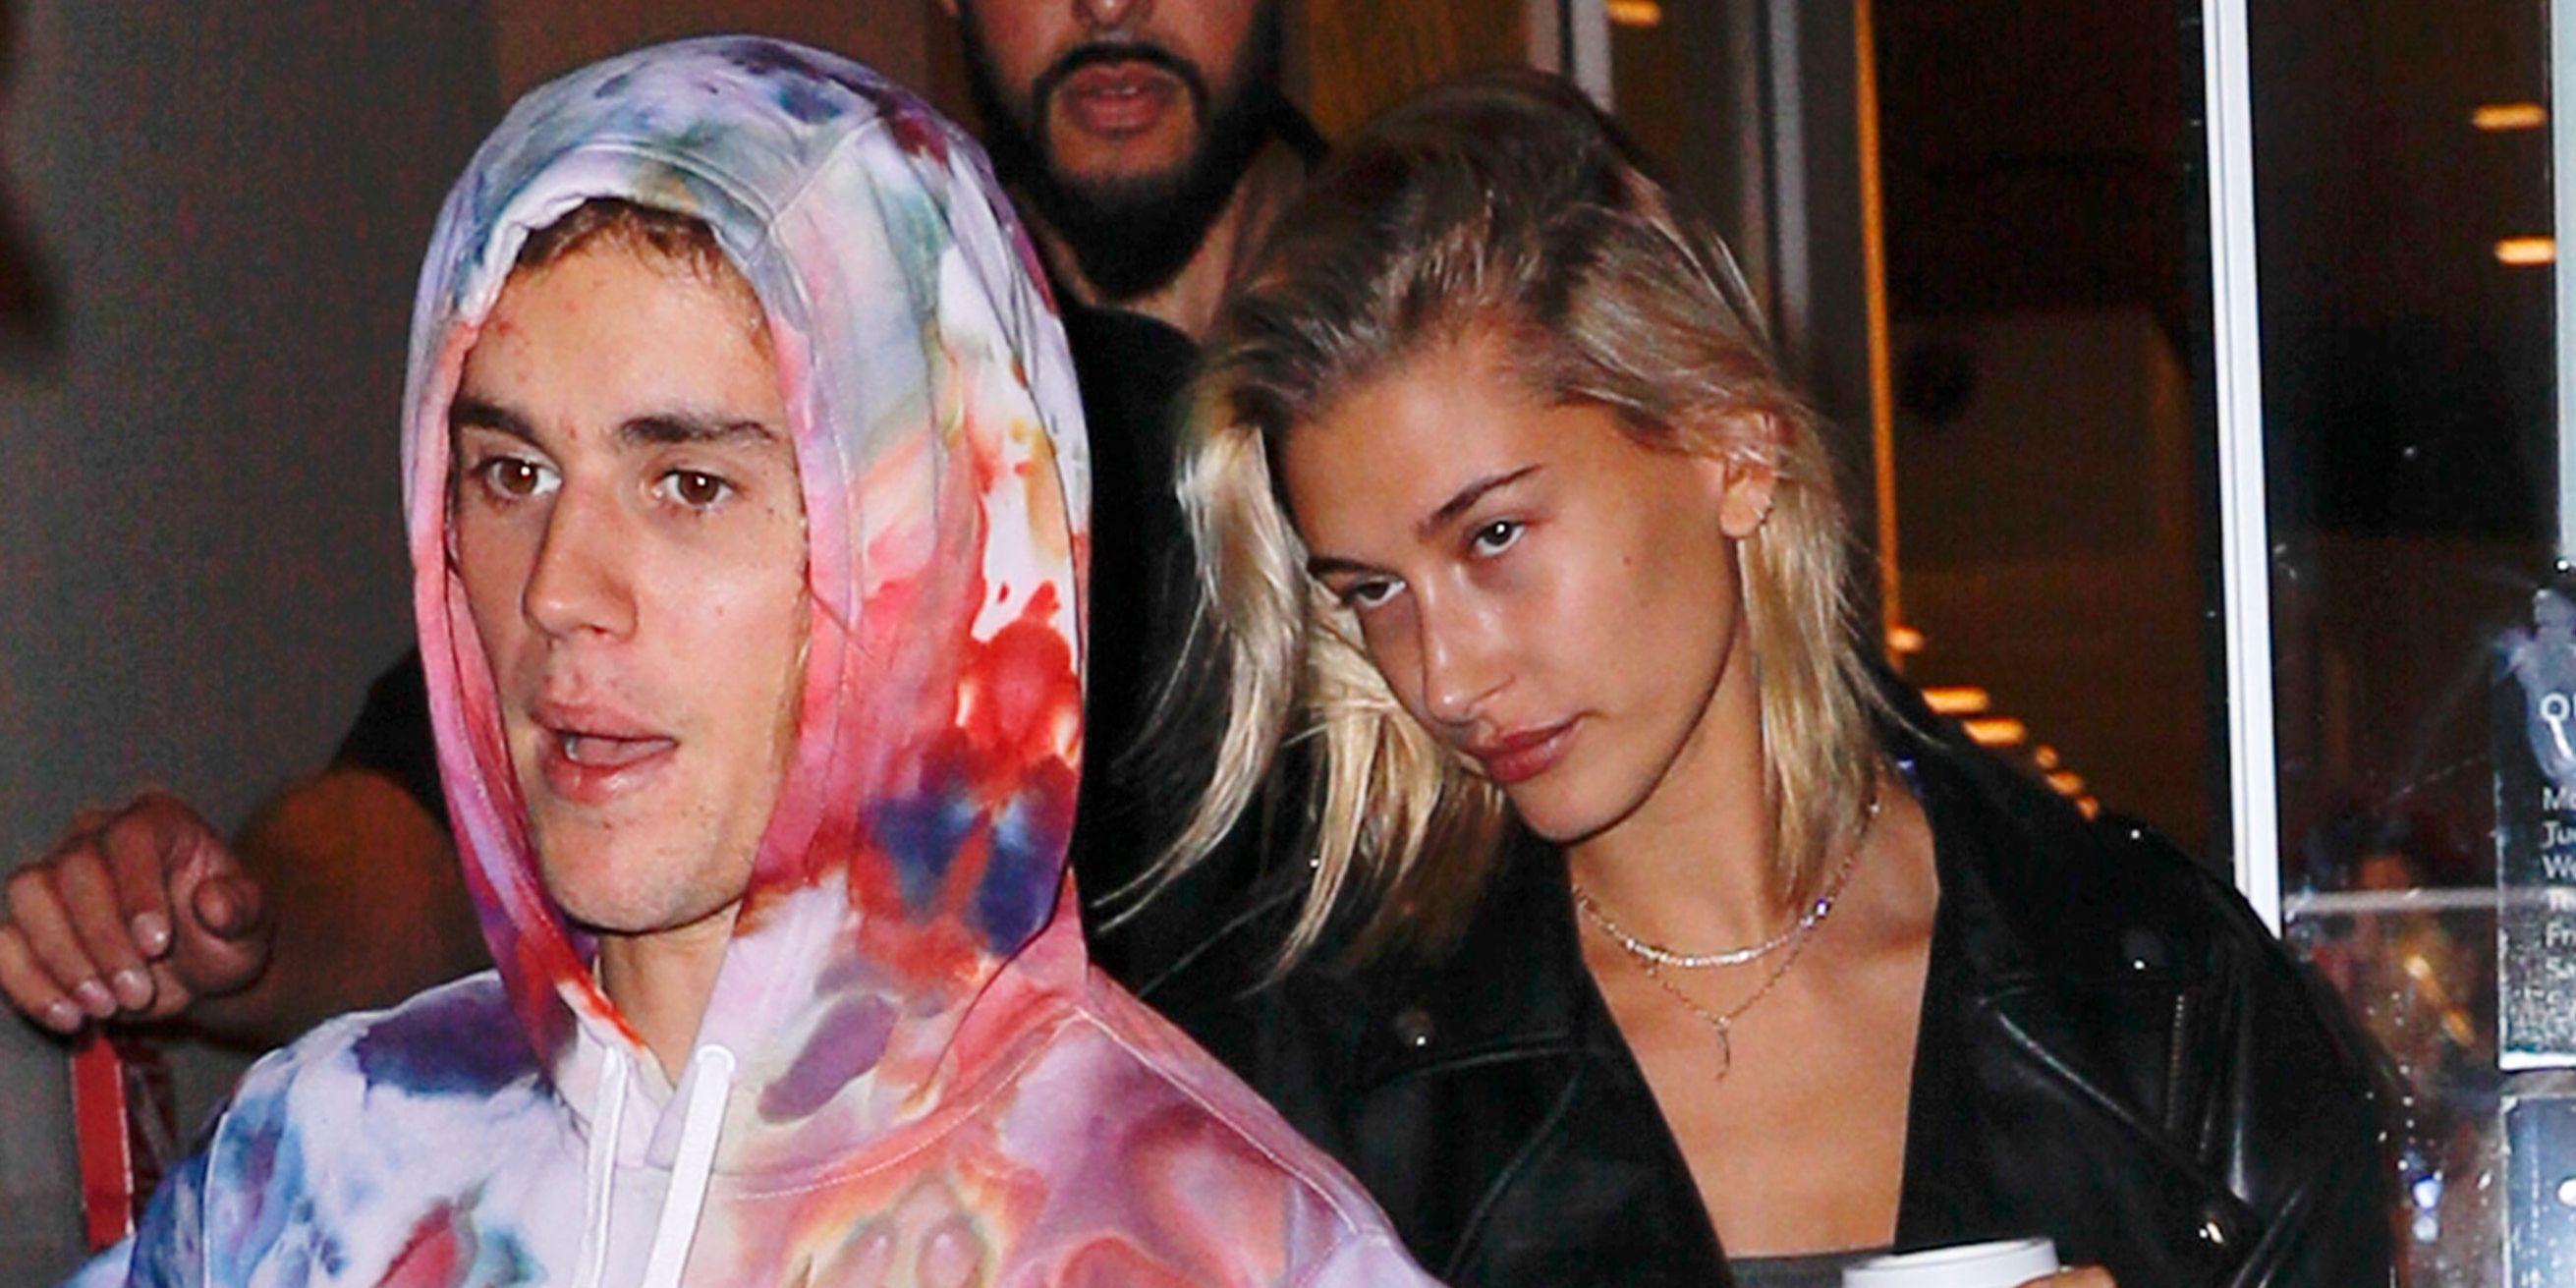 Justin Bieber and Hailey Baldwin Are Now Honeymooning on Italy's Amalfi Coast